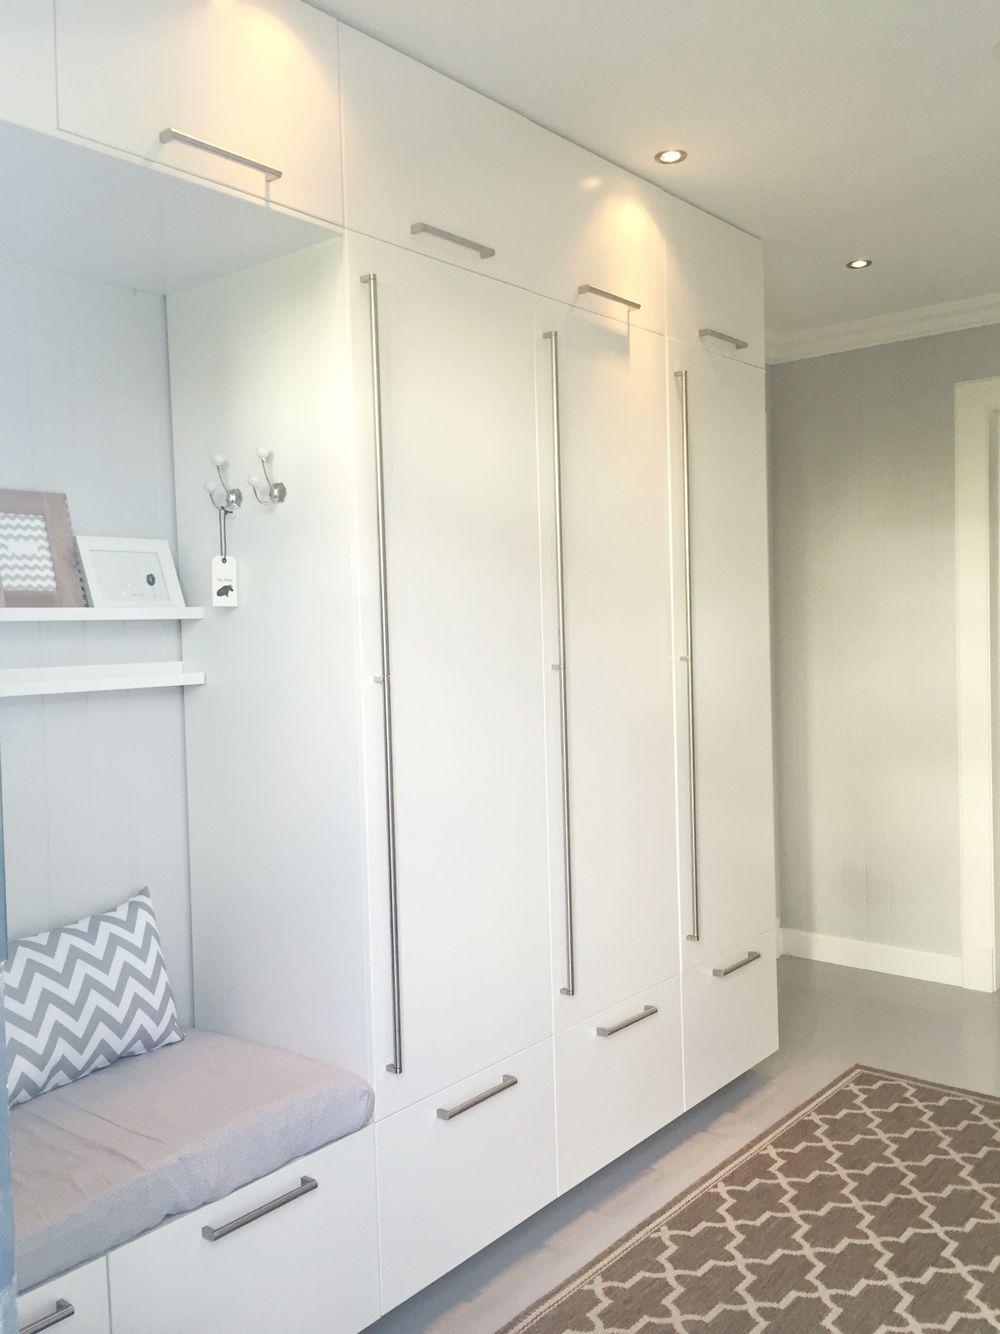 Hallway storage cabinet  IKEA hacked kitchen rebuilt as  meters wardrobes  Condo mur